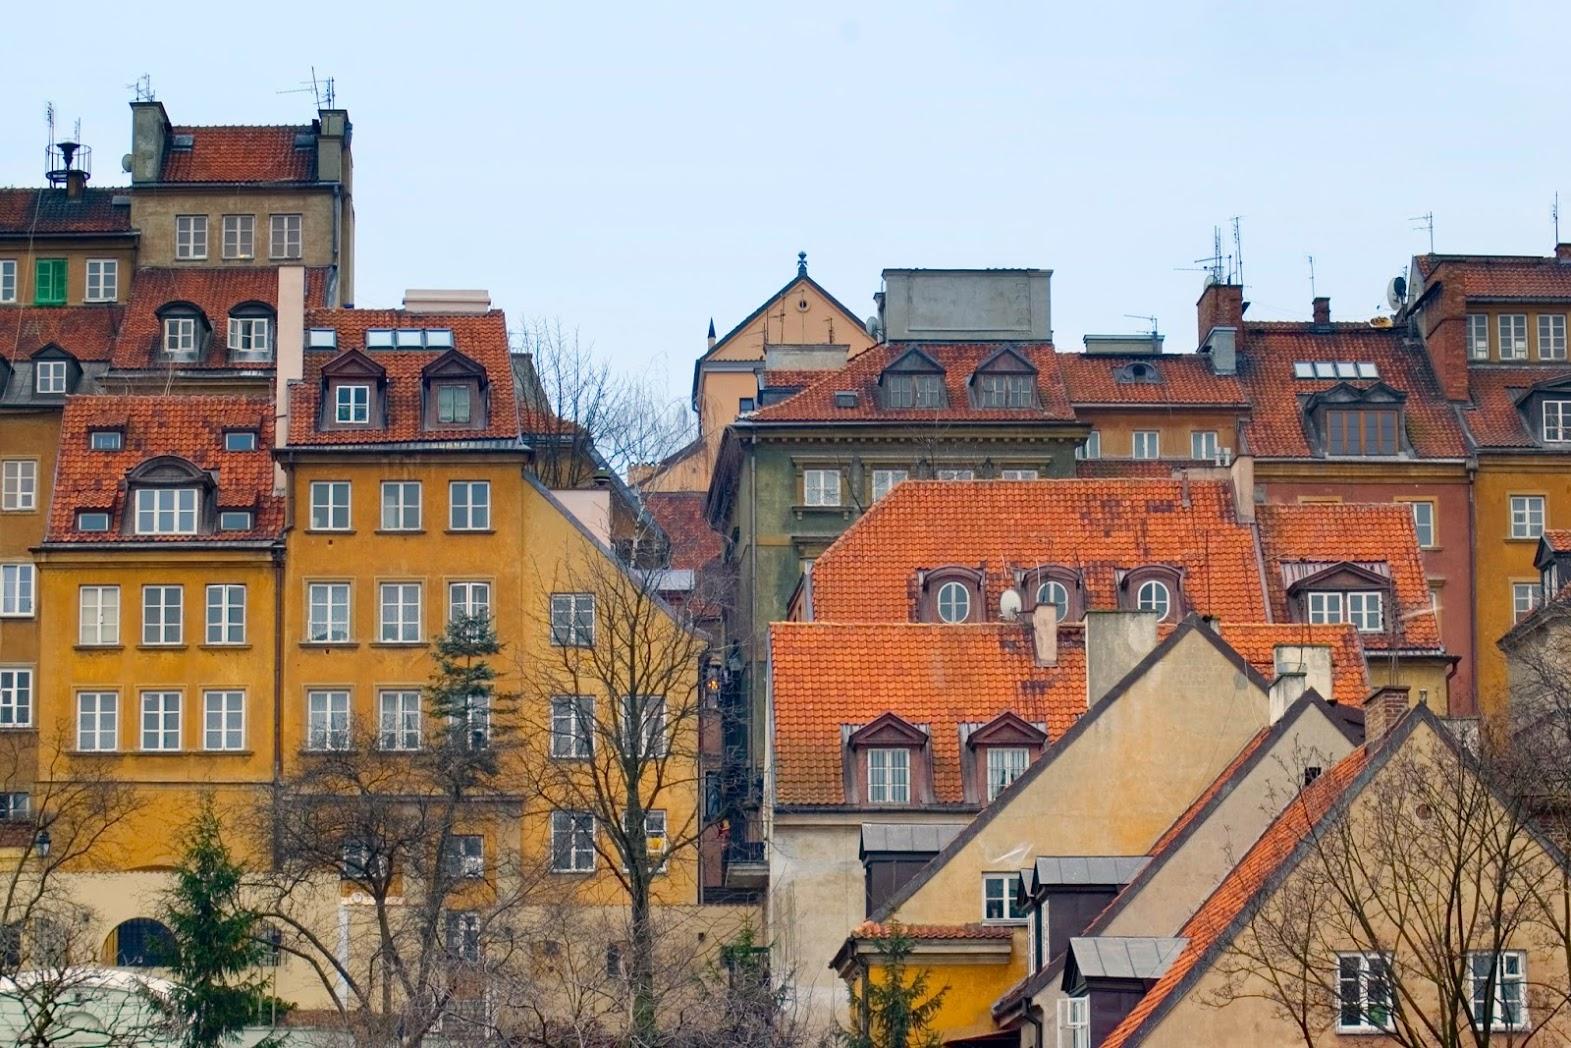 © Jarek Zuzga, oknonawarszawe.pl